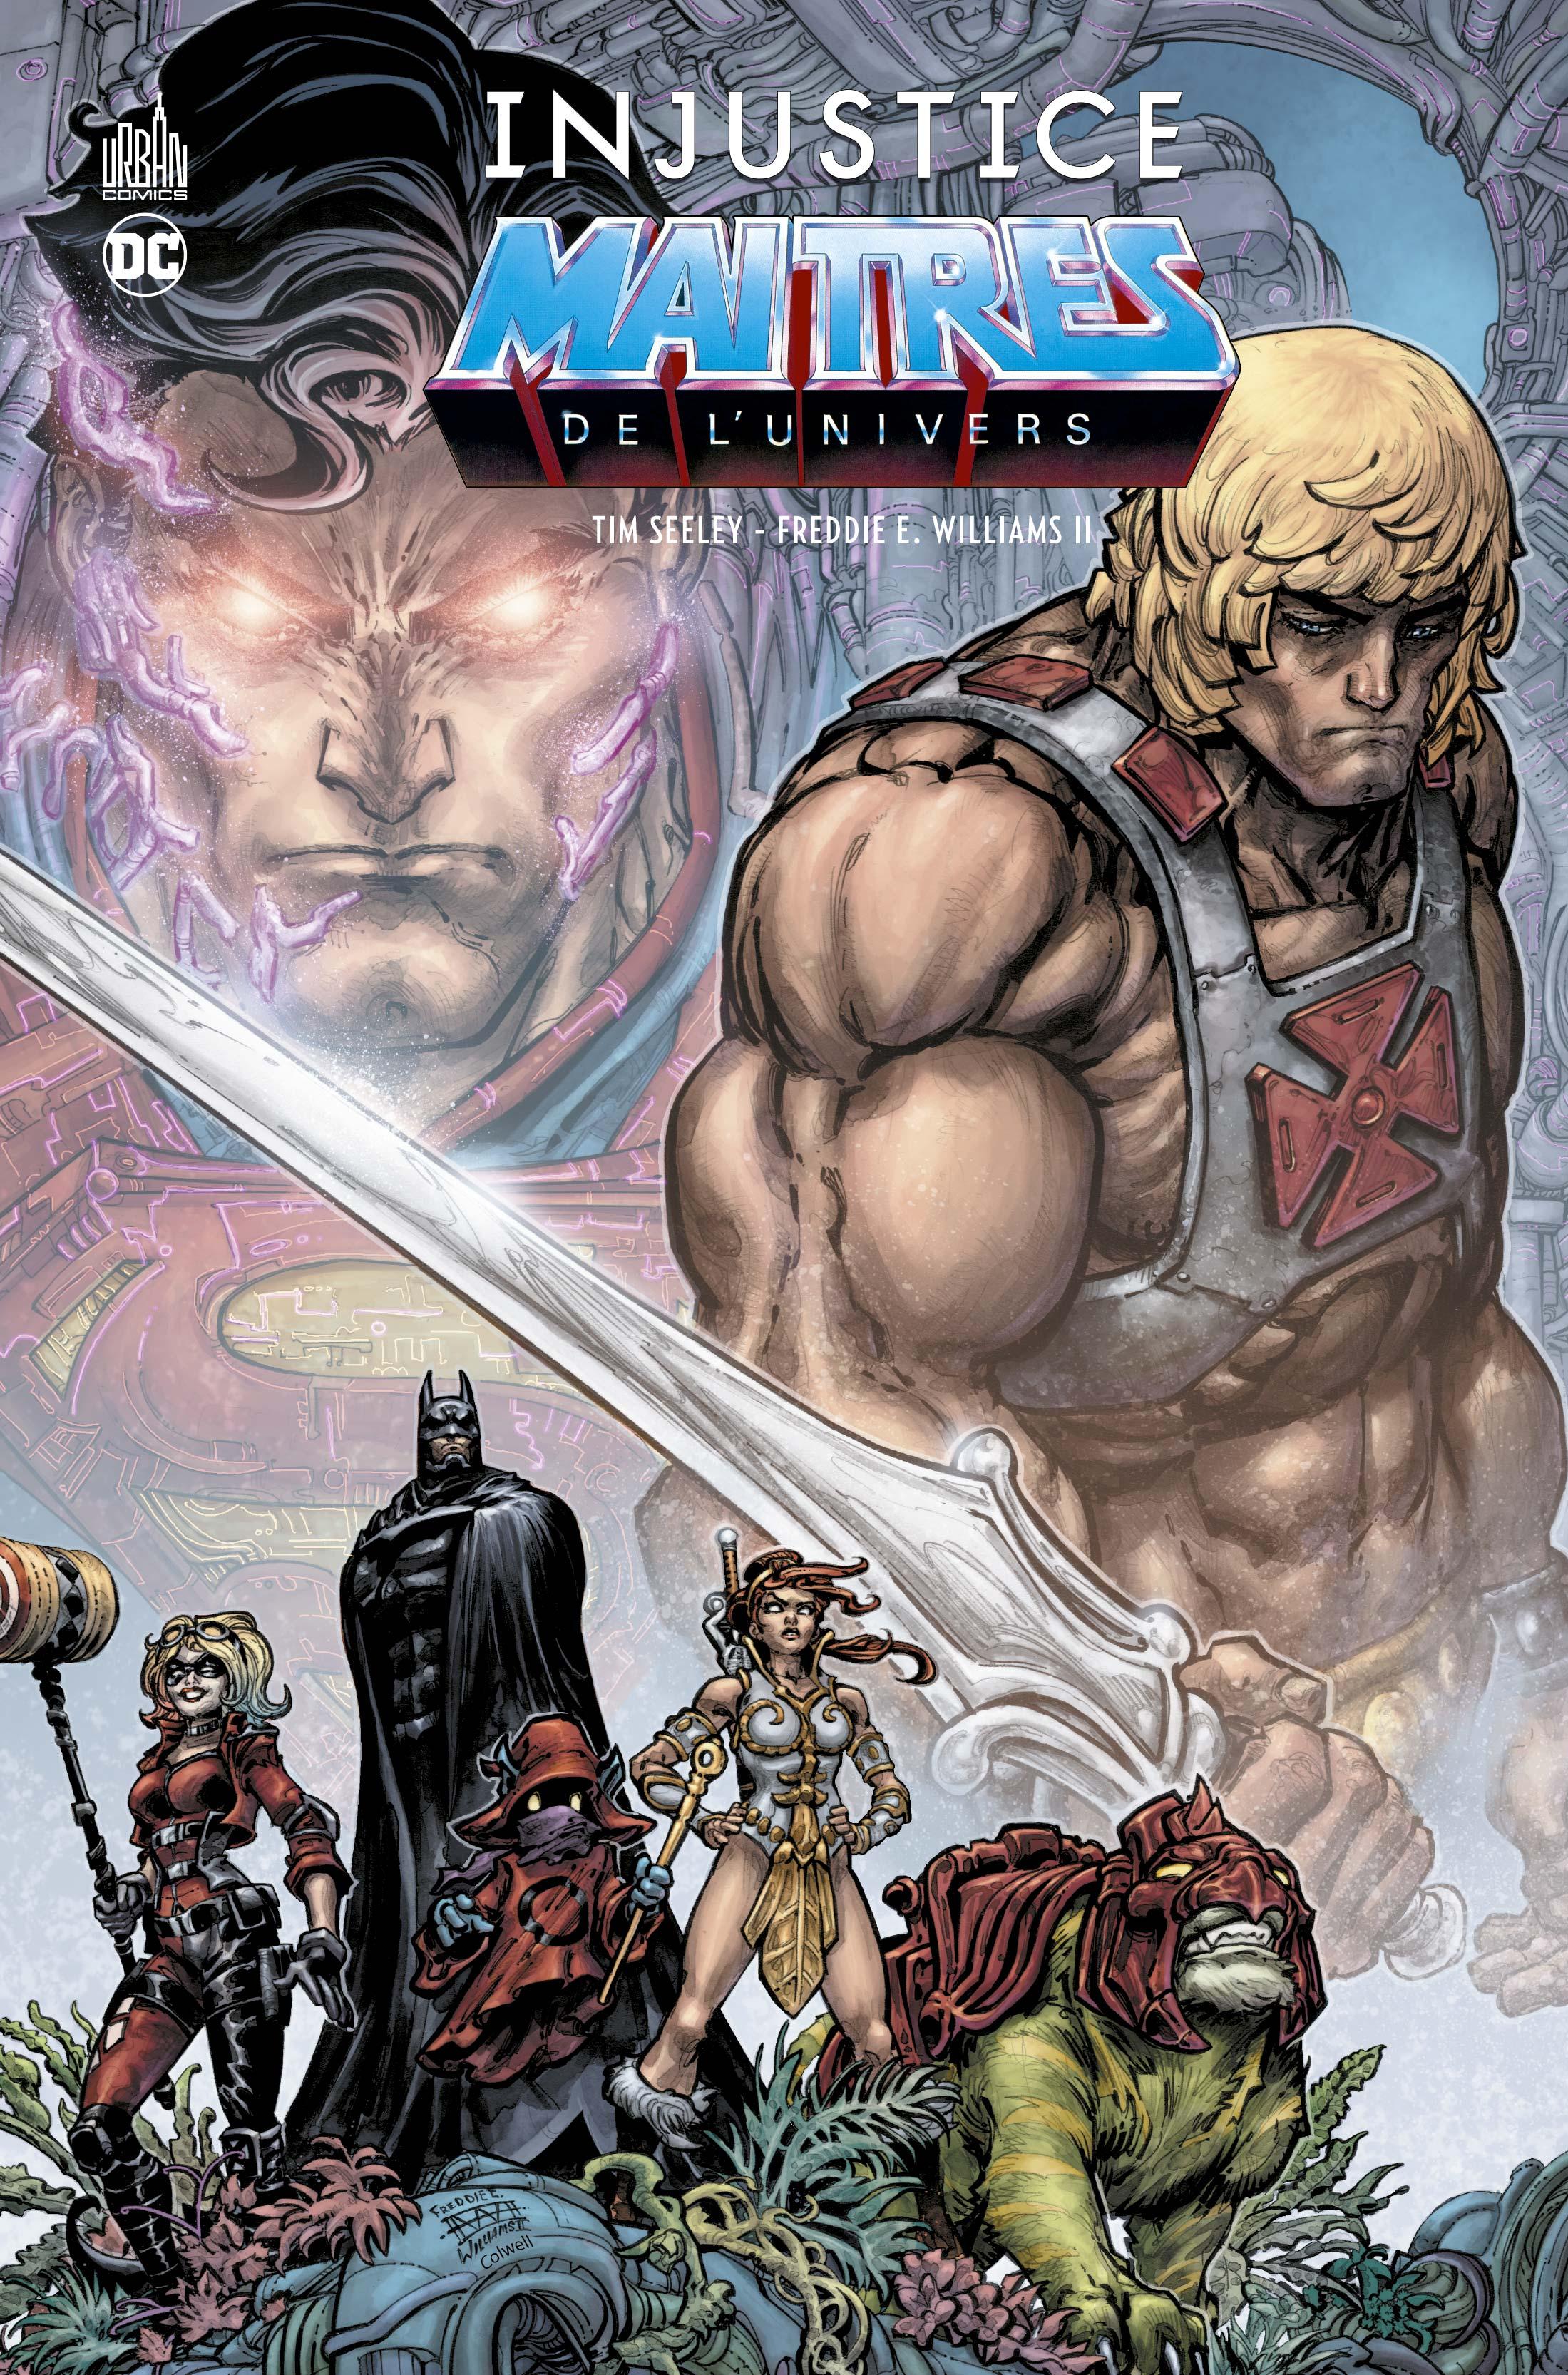 Injustice vs. He-Man and the Masters of The Universe 1 - Injustice vs les maîtres de l'univers